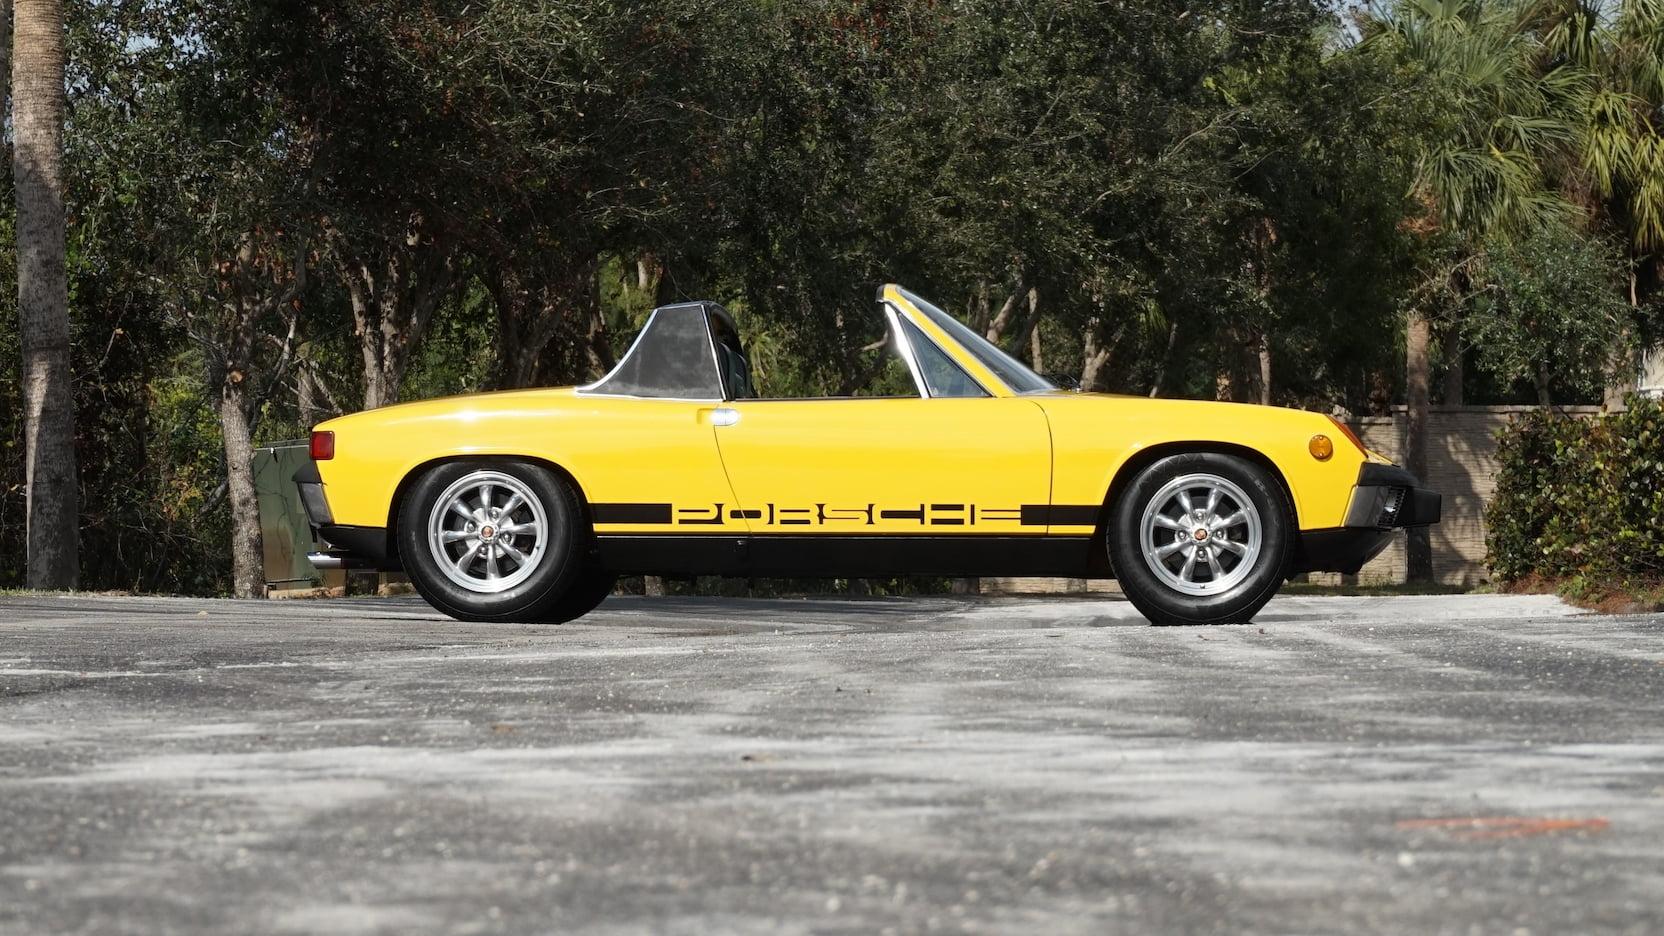 1973 Porsche 914 yellow side profile